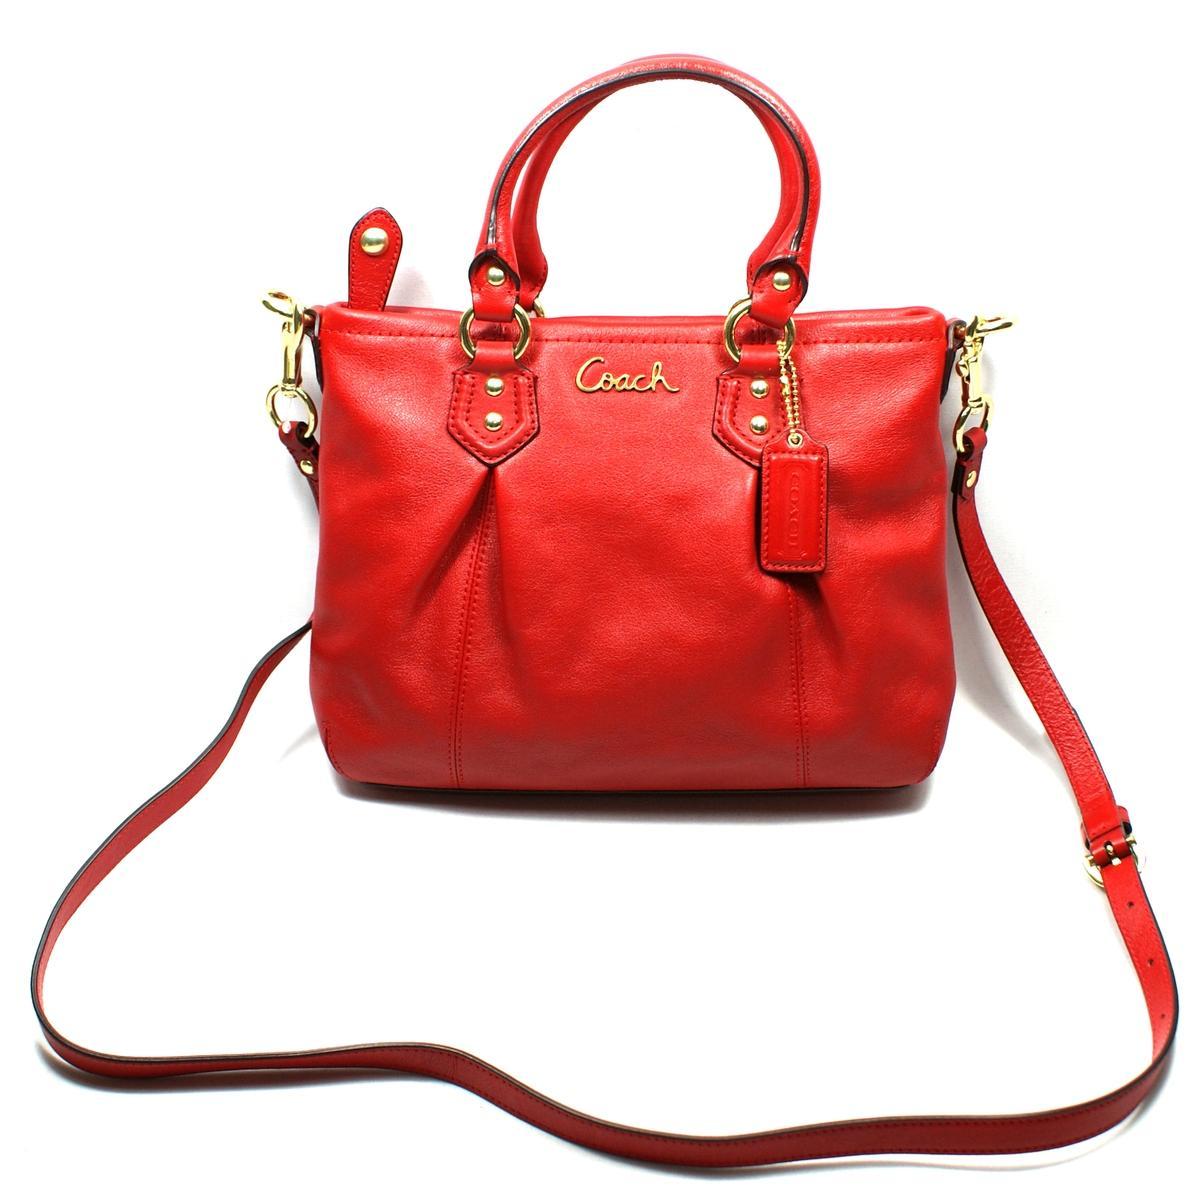 0aa29f6e28182 Coach Ashley Leather Mini Tote/ Cross Body Bag Cherry #20342 | Coach ...